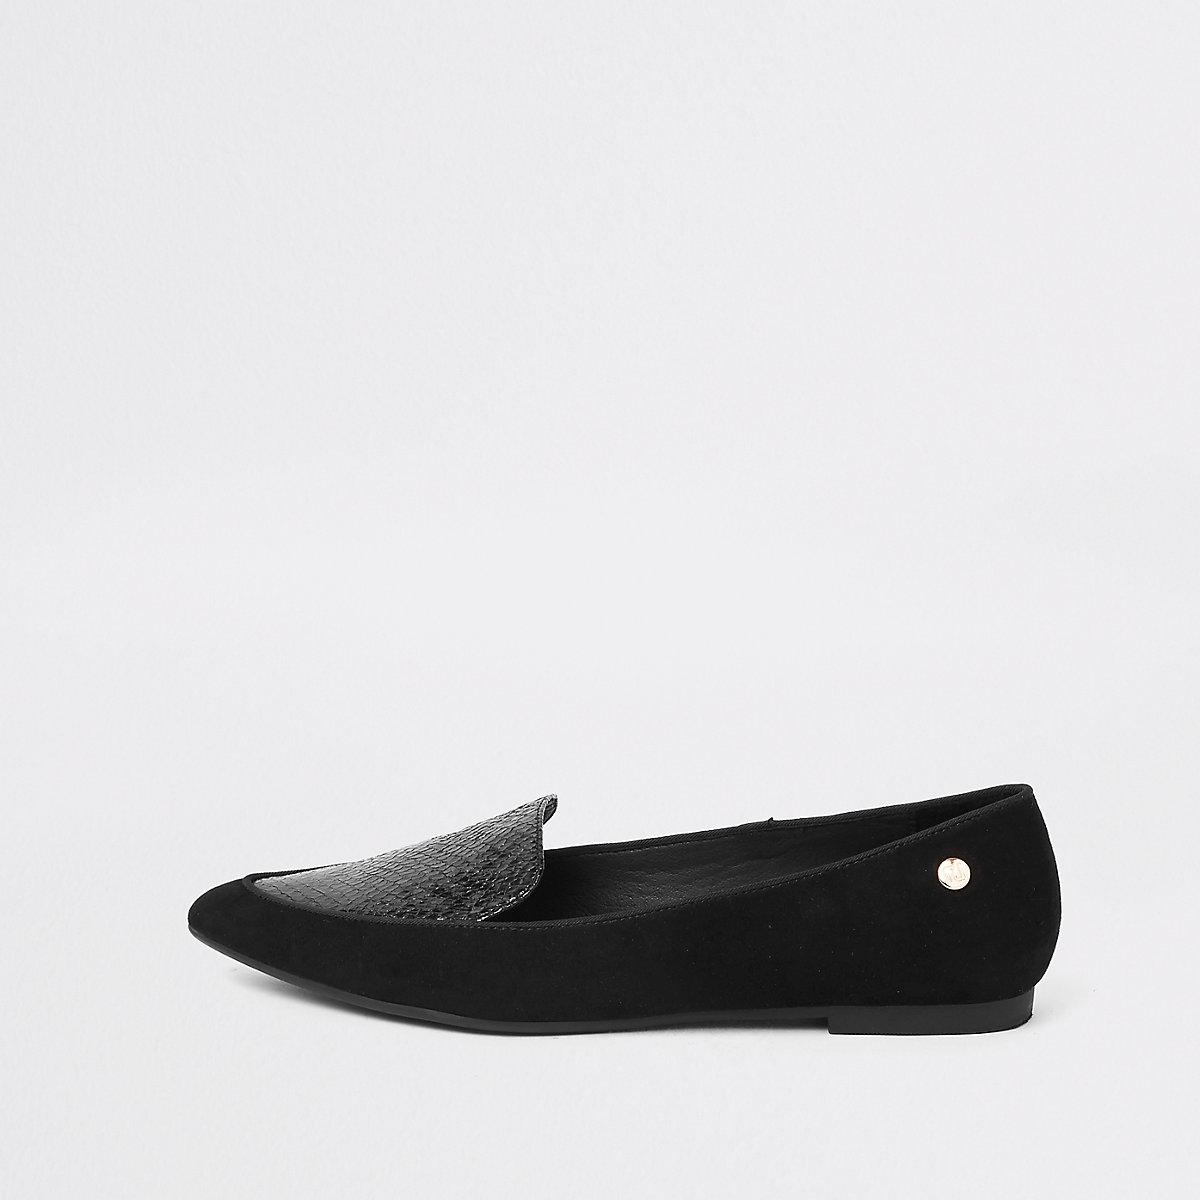 Zwarte puntige loafers met brede pasvorm